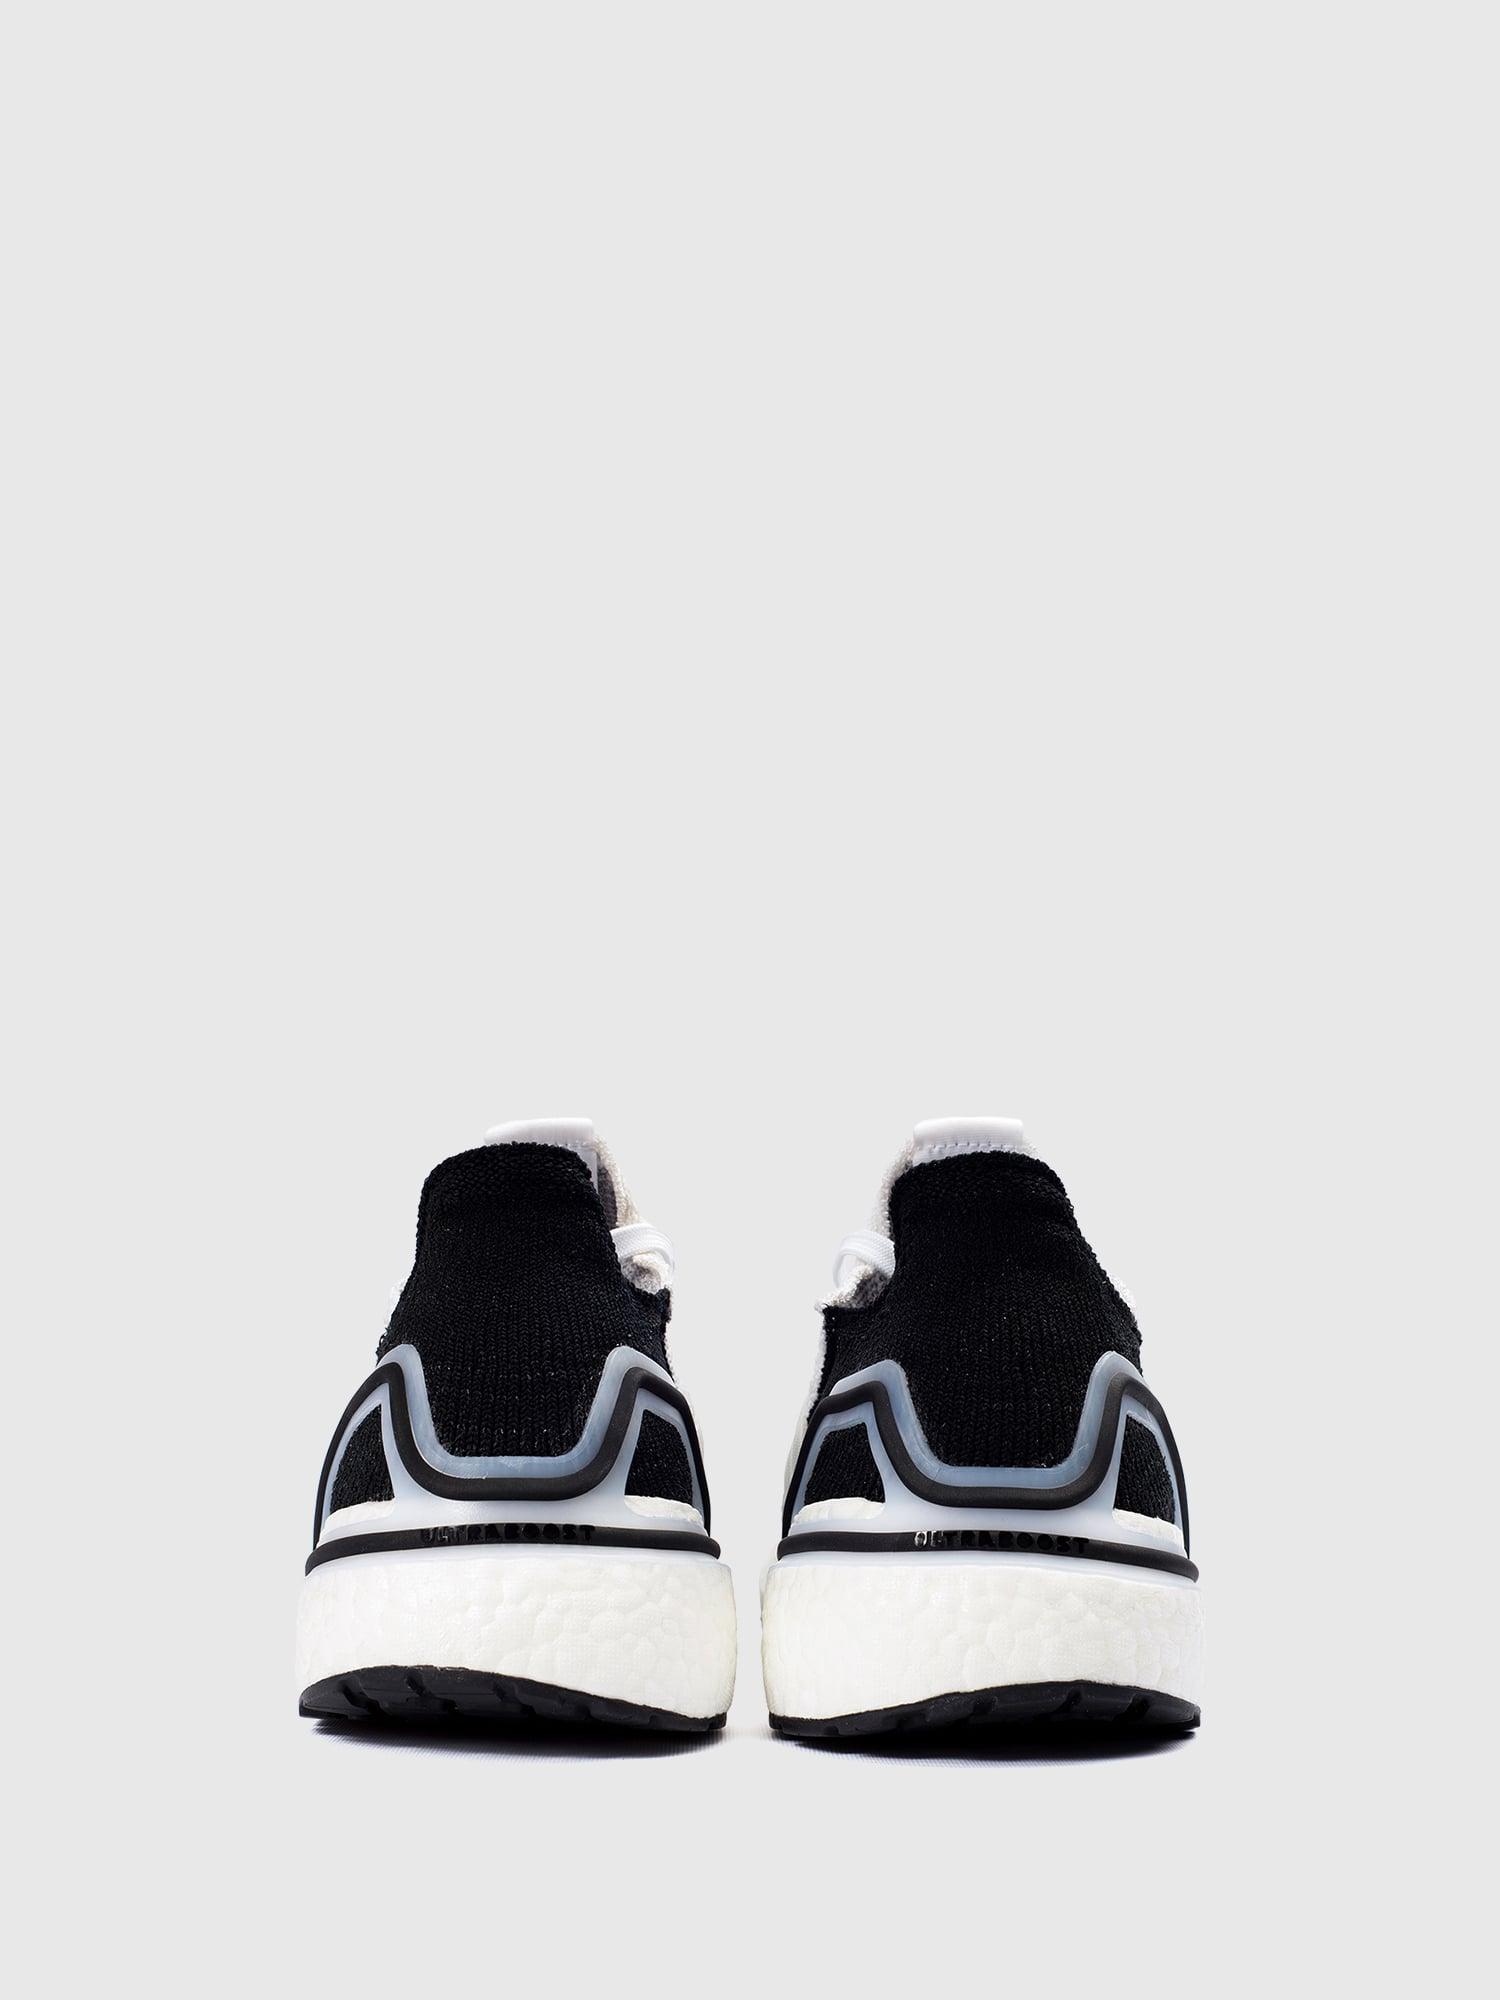 Adidas Ultra Boost 2019 Panda